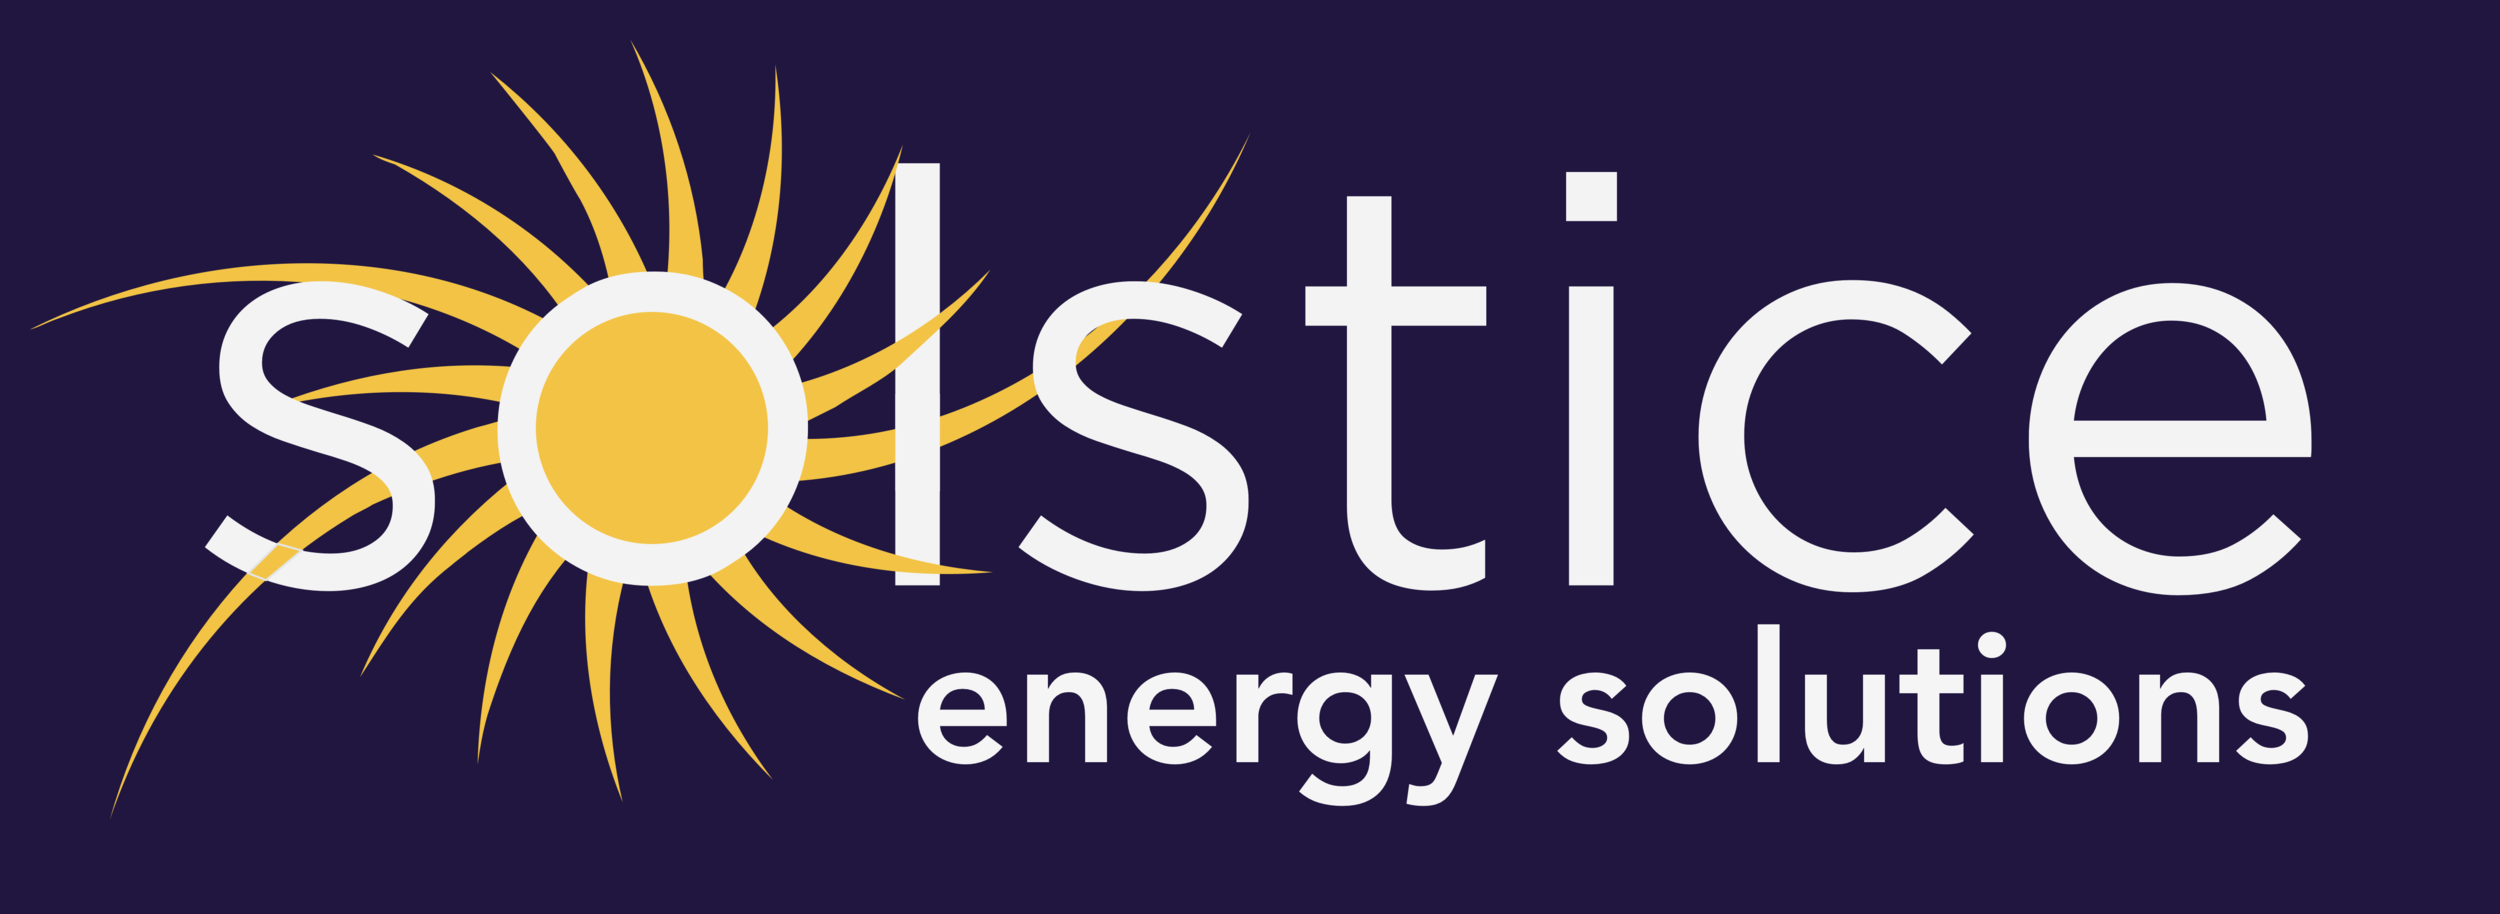 solstice-white-purple-bg.png